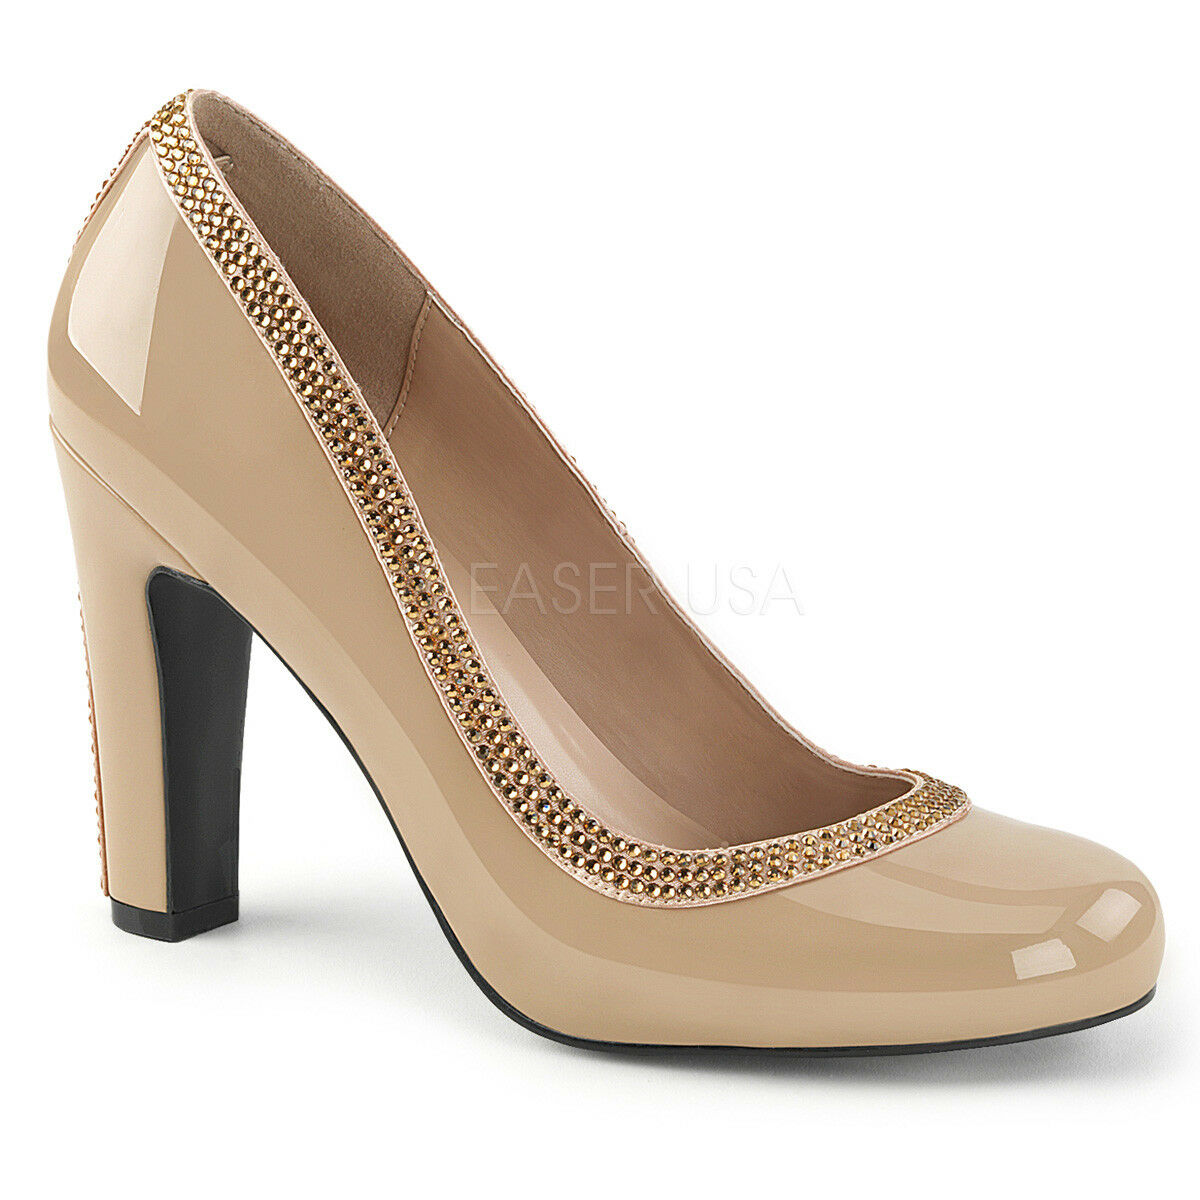 PLEASER PINK LABEL QUEEN 04 BLOCK HEEL ROUND TOE Schuhe COURT Schuhe TOE DRAG TRANSVESTITE 43de42